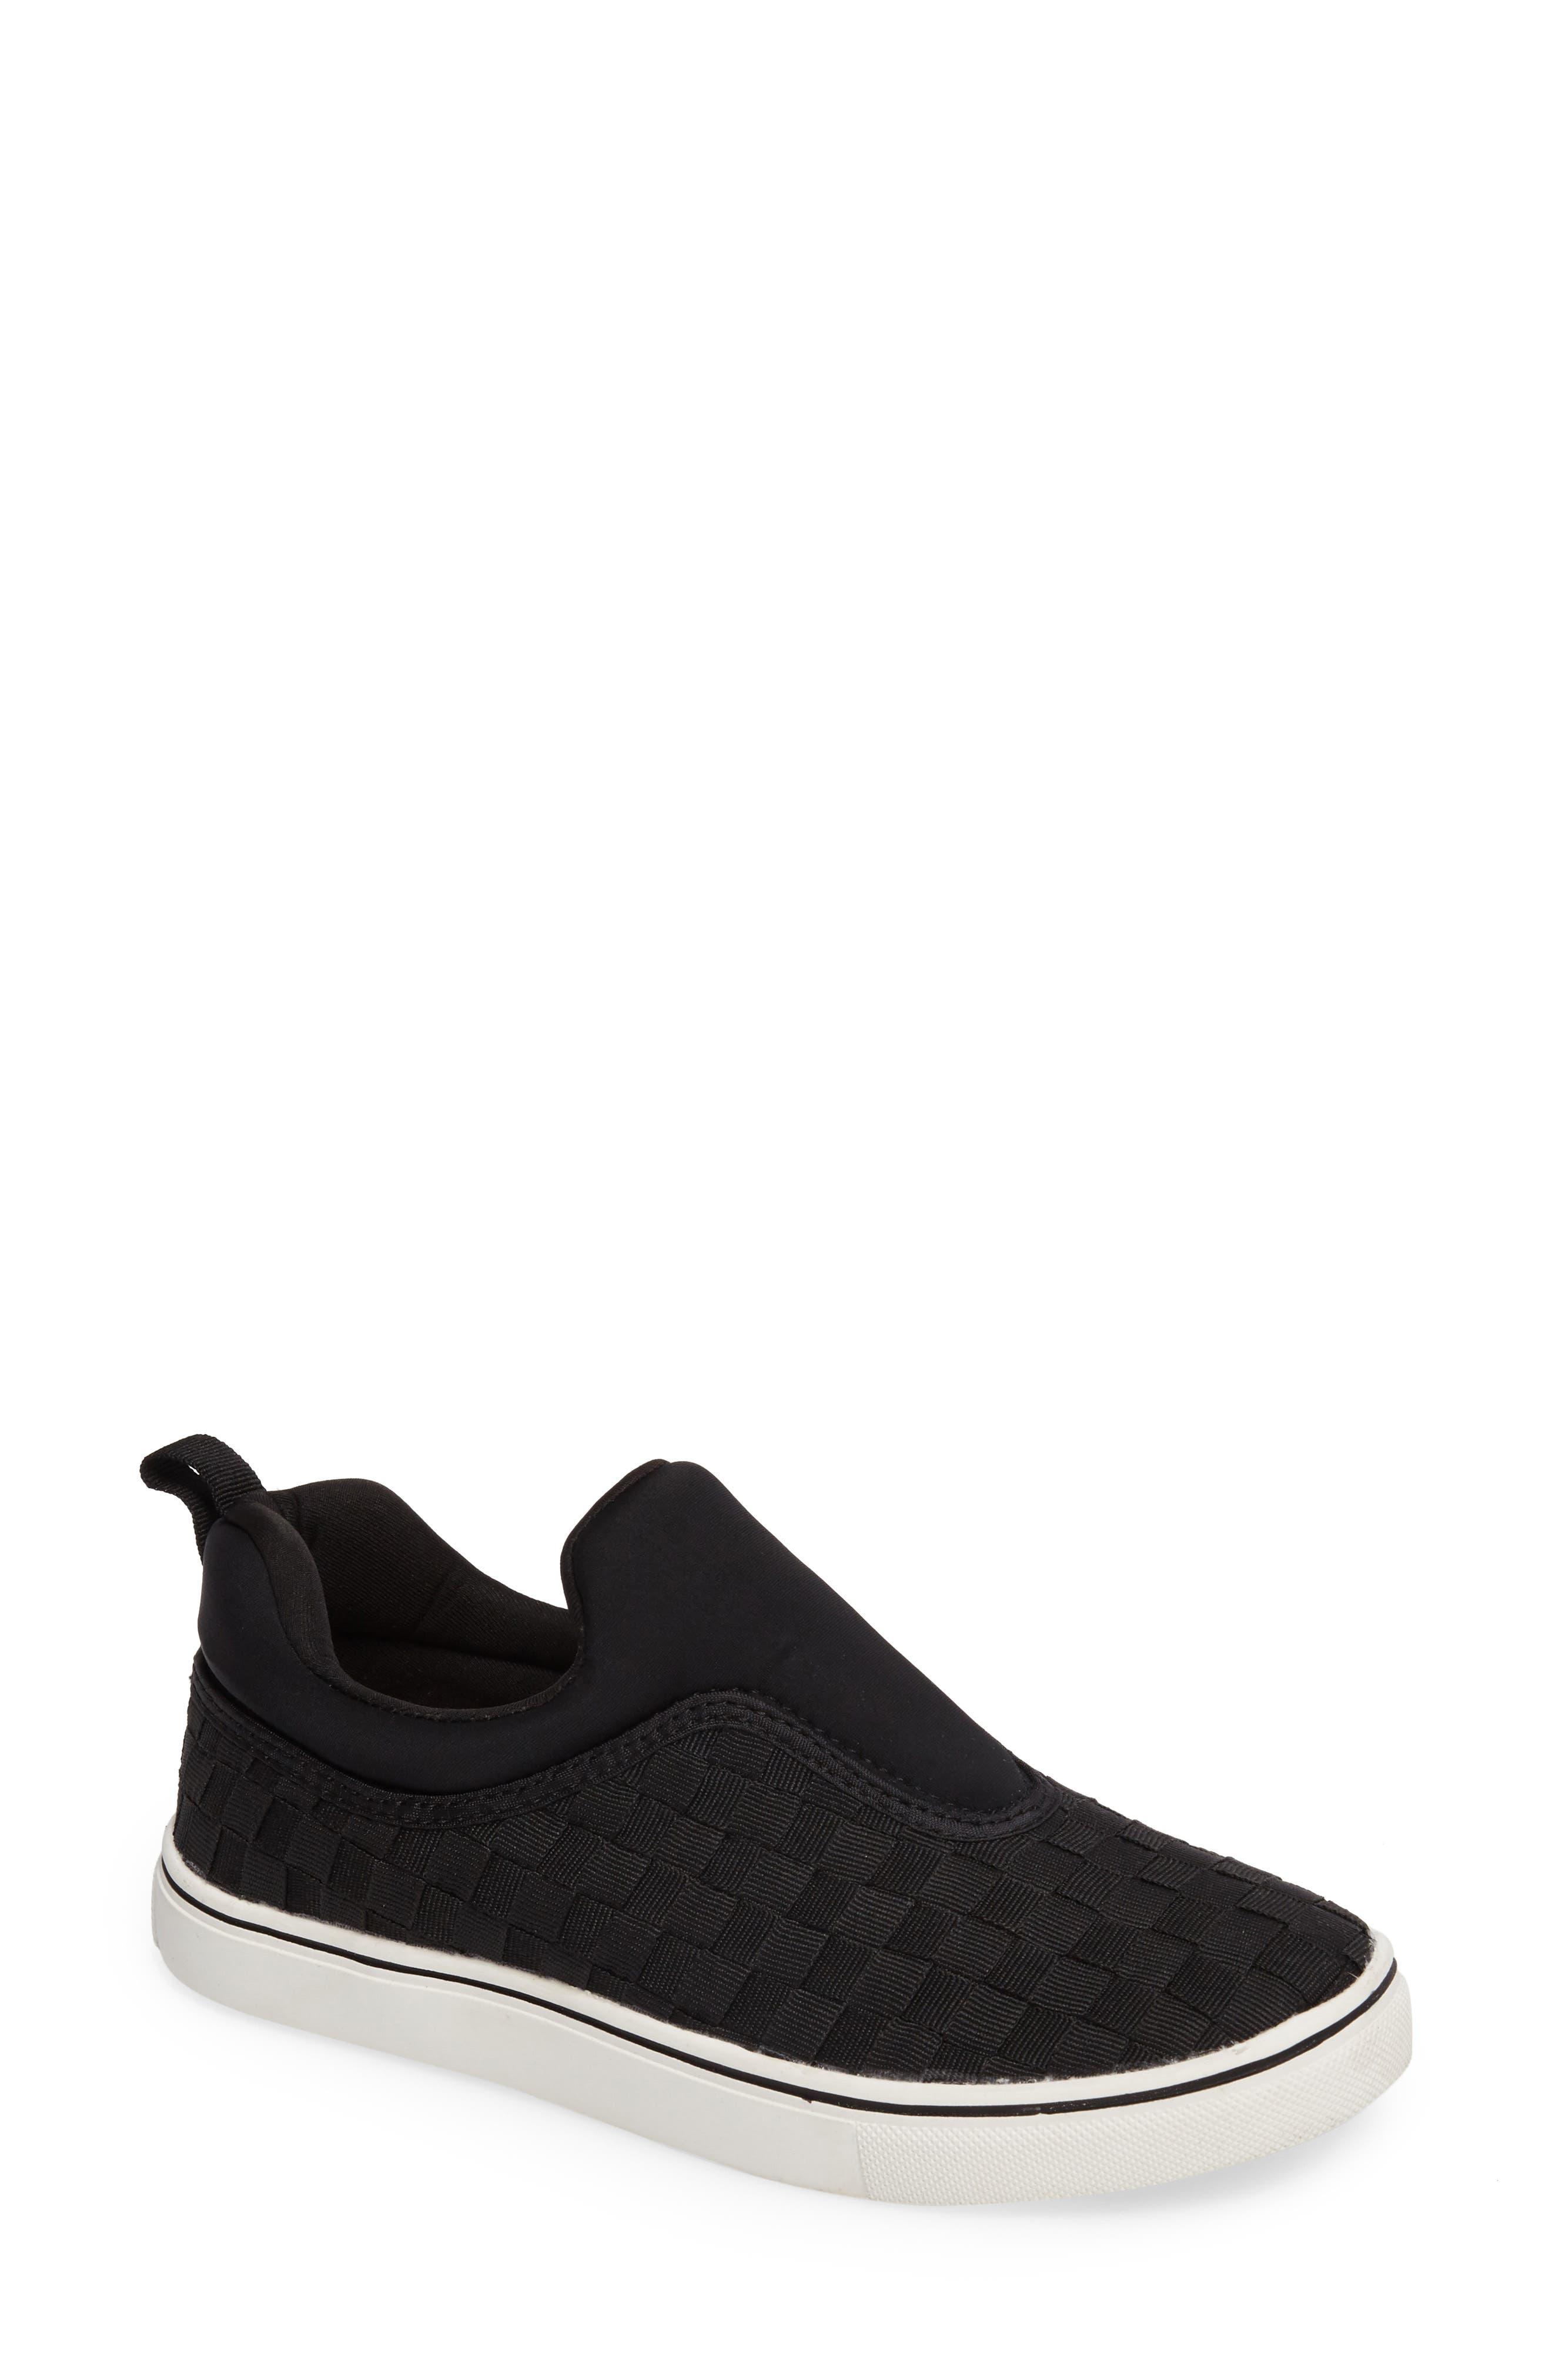 BERNIE MEV., Bernie Mev Joan Slip-On Sneaker, Main thumbnail 1, color, BLACK/ BLACK FABRIC